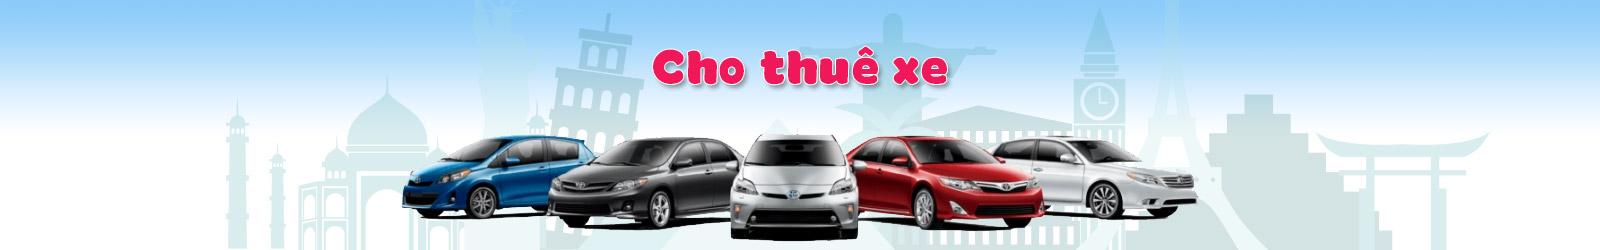 banner-cho-thue